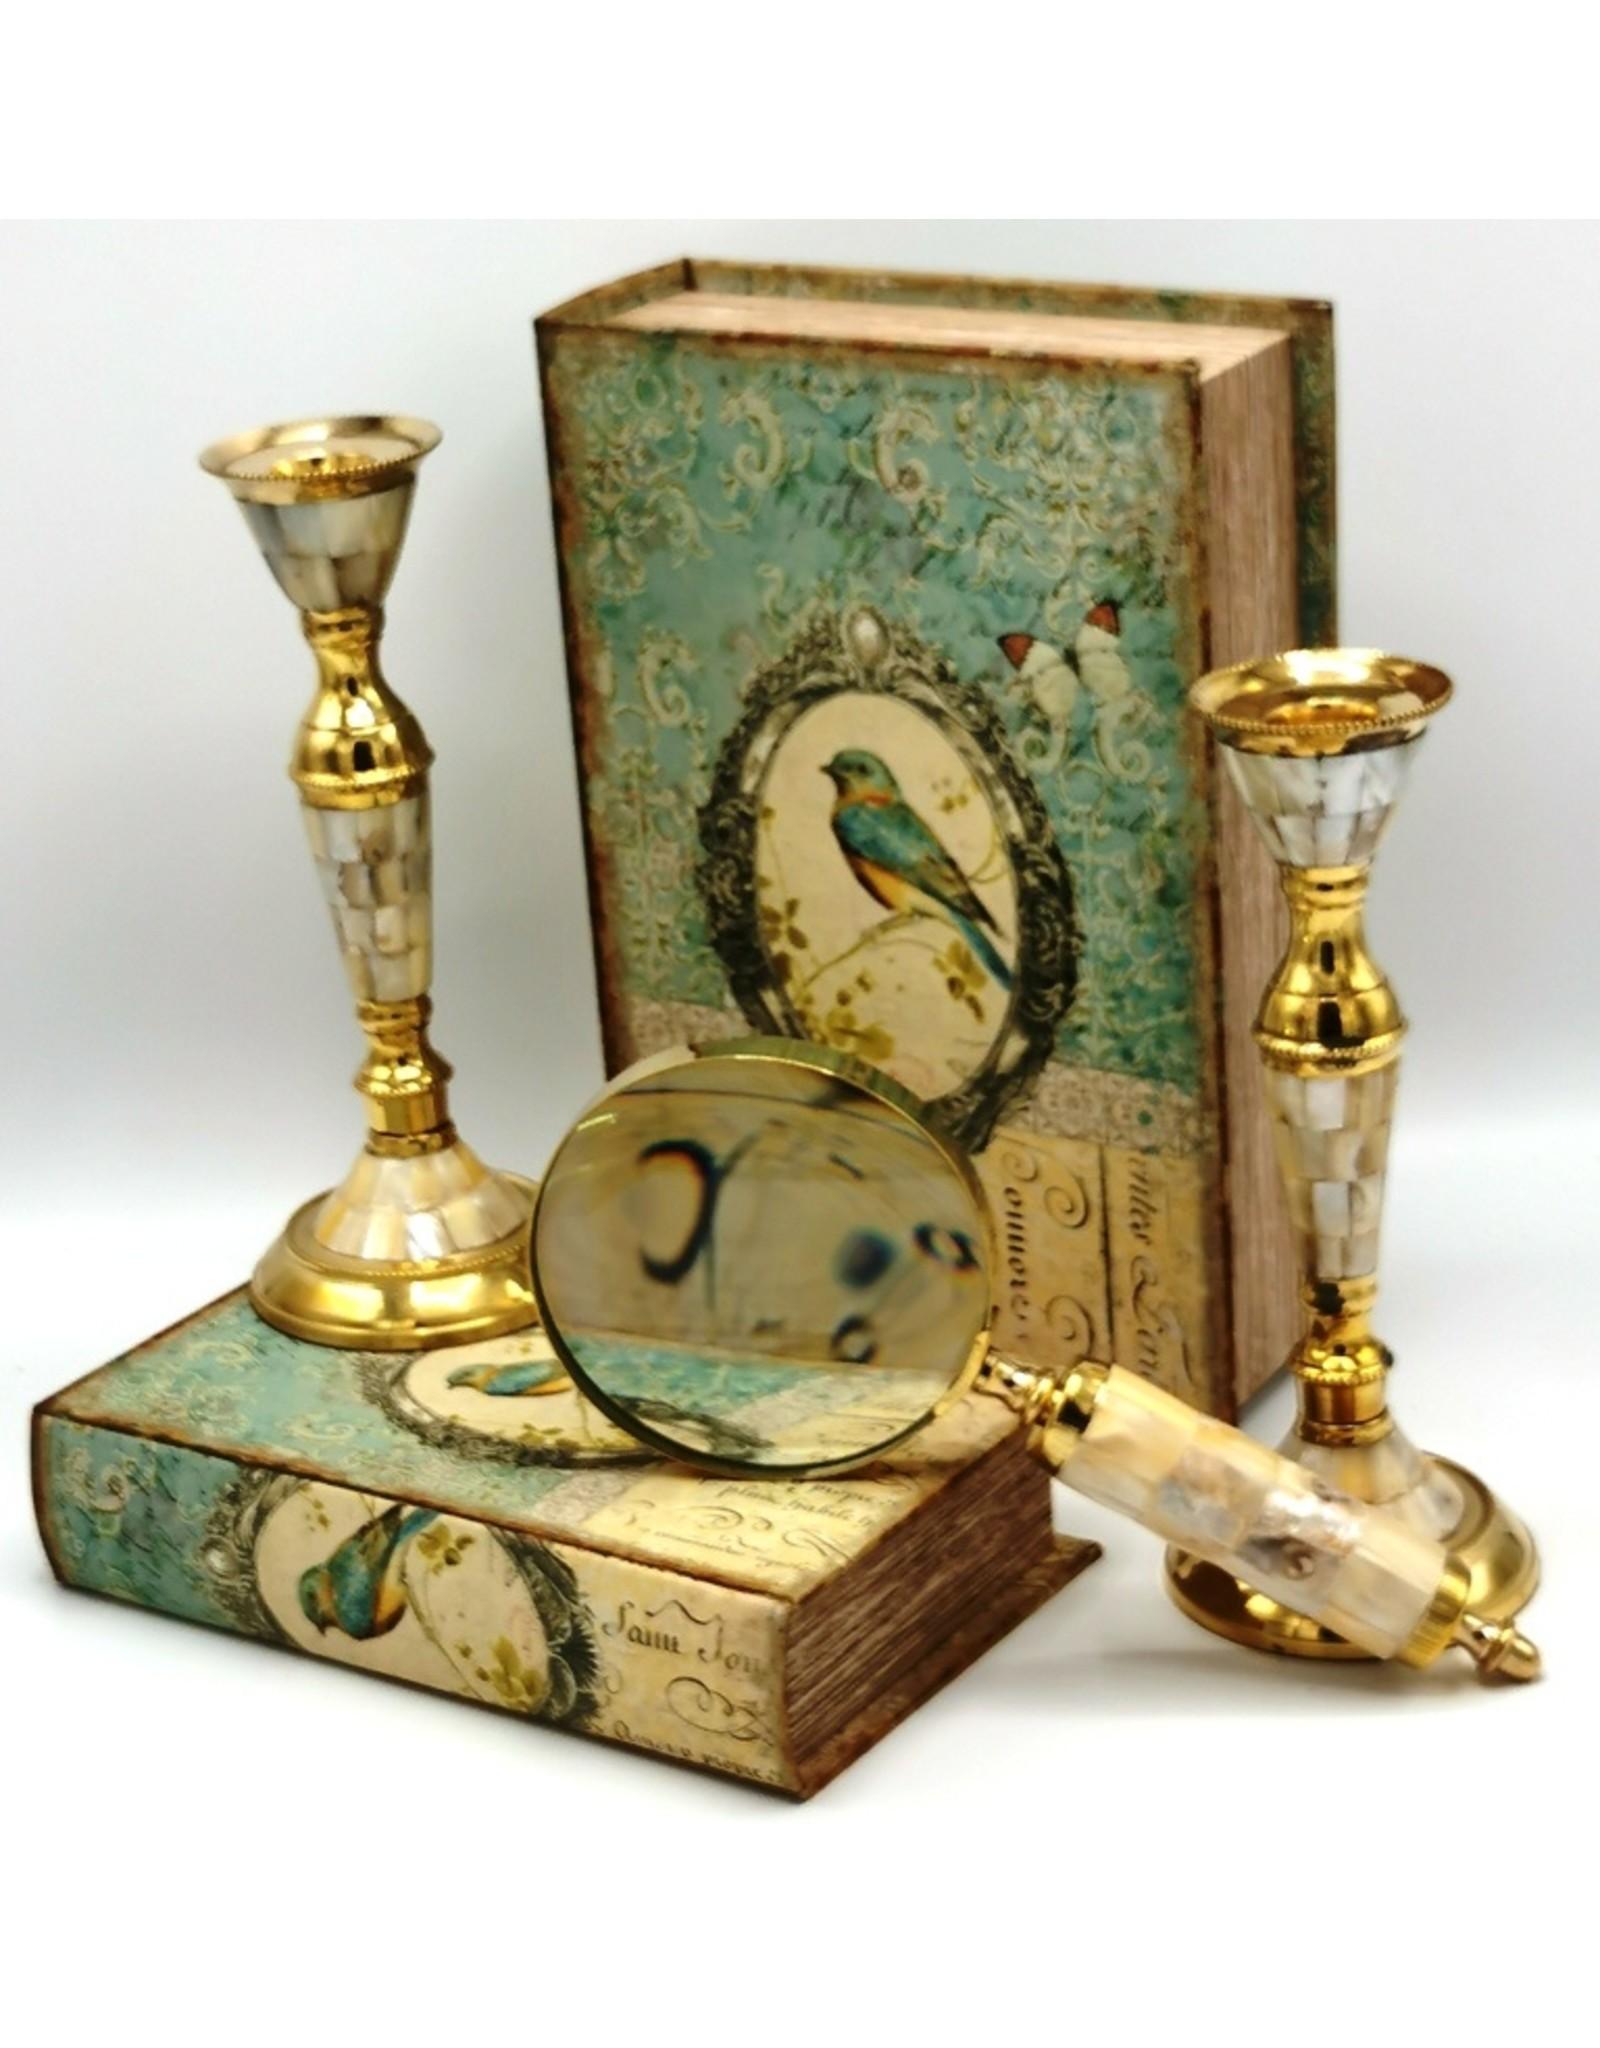 Kandelaar van messing en parelmoer Miscellaneous - Candlestick of brass and mother of pearl